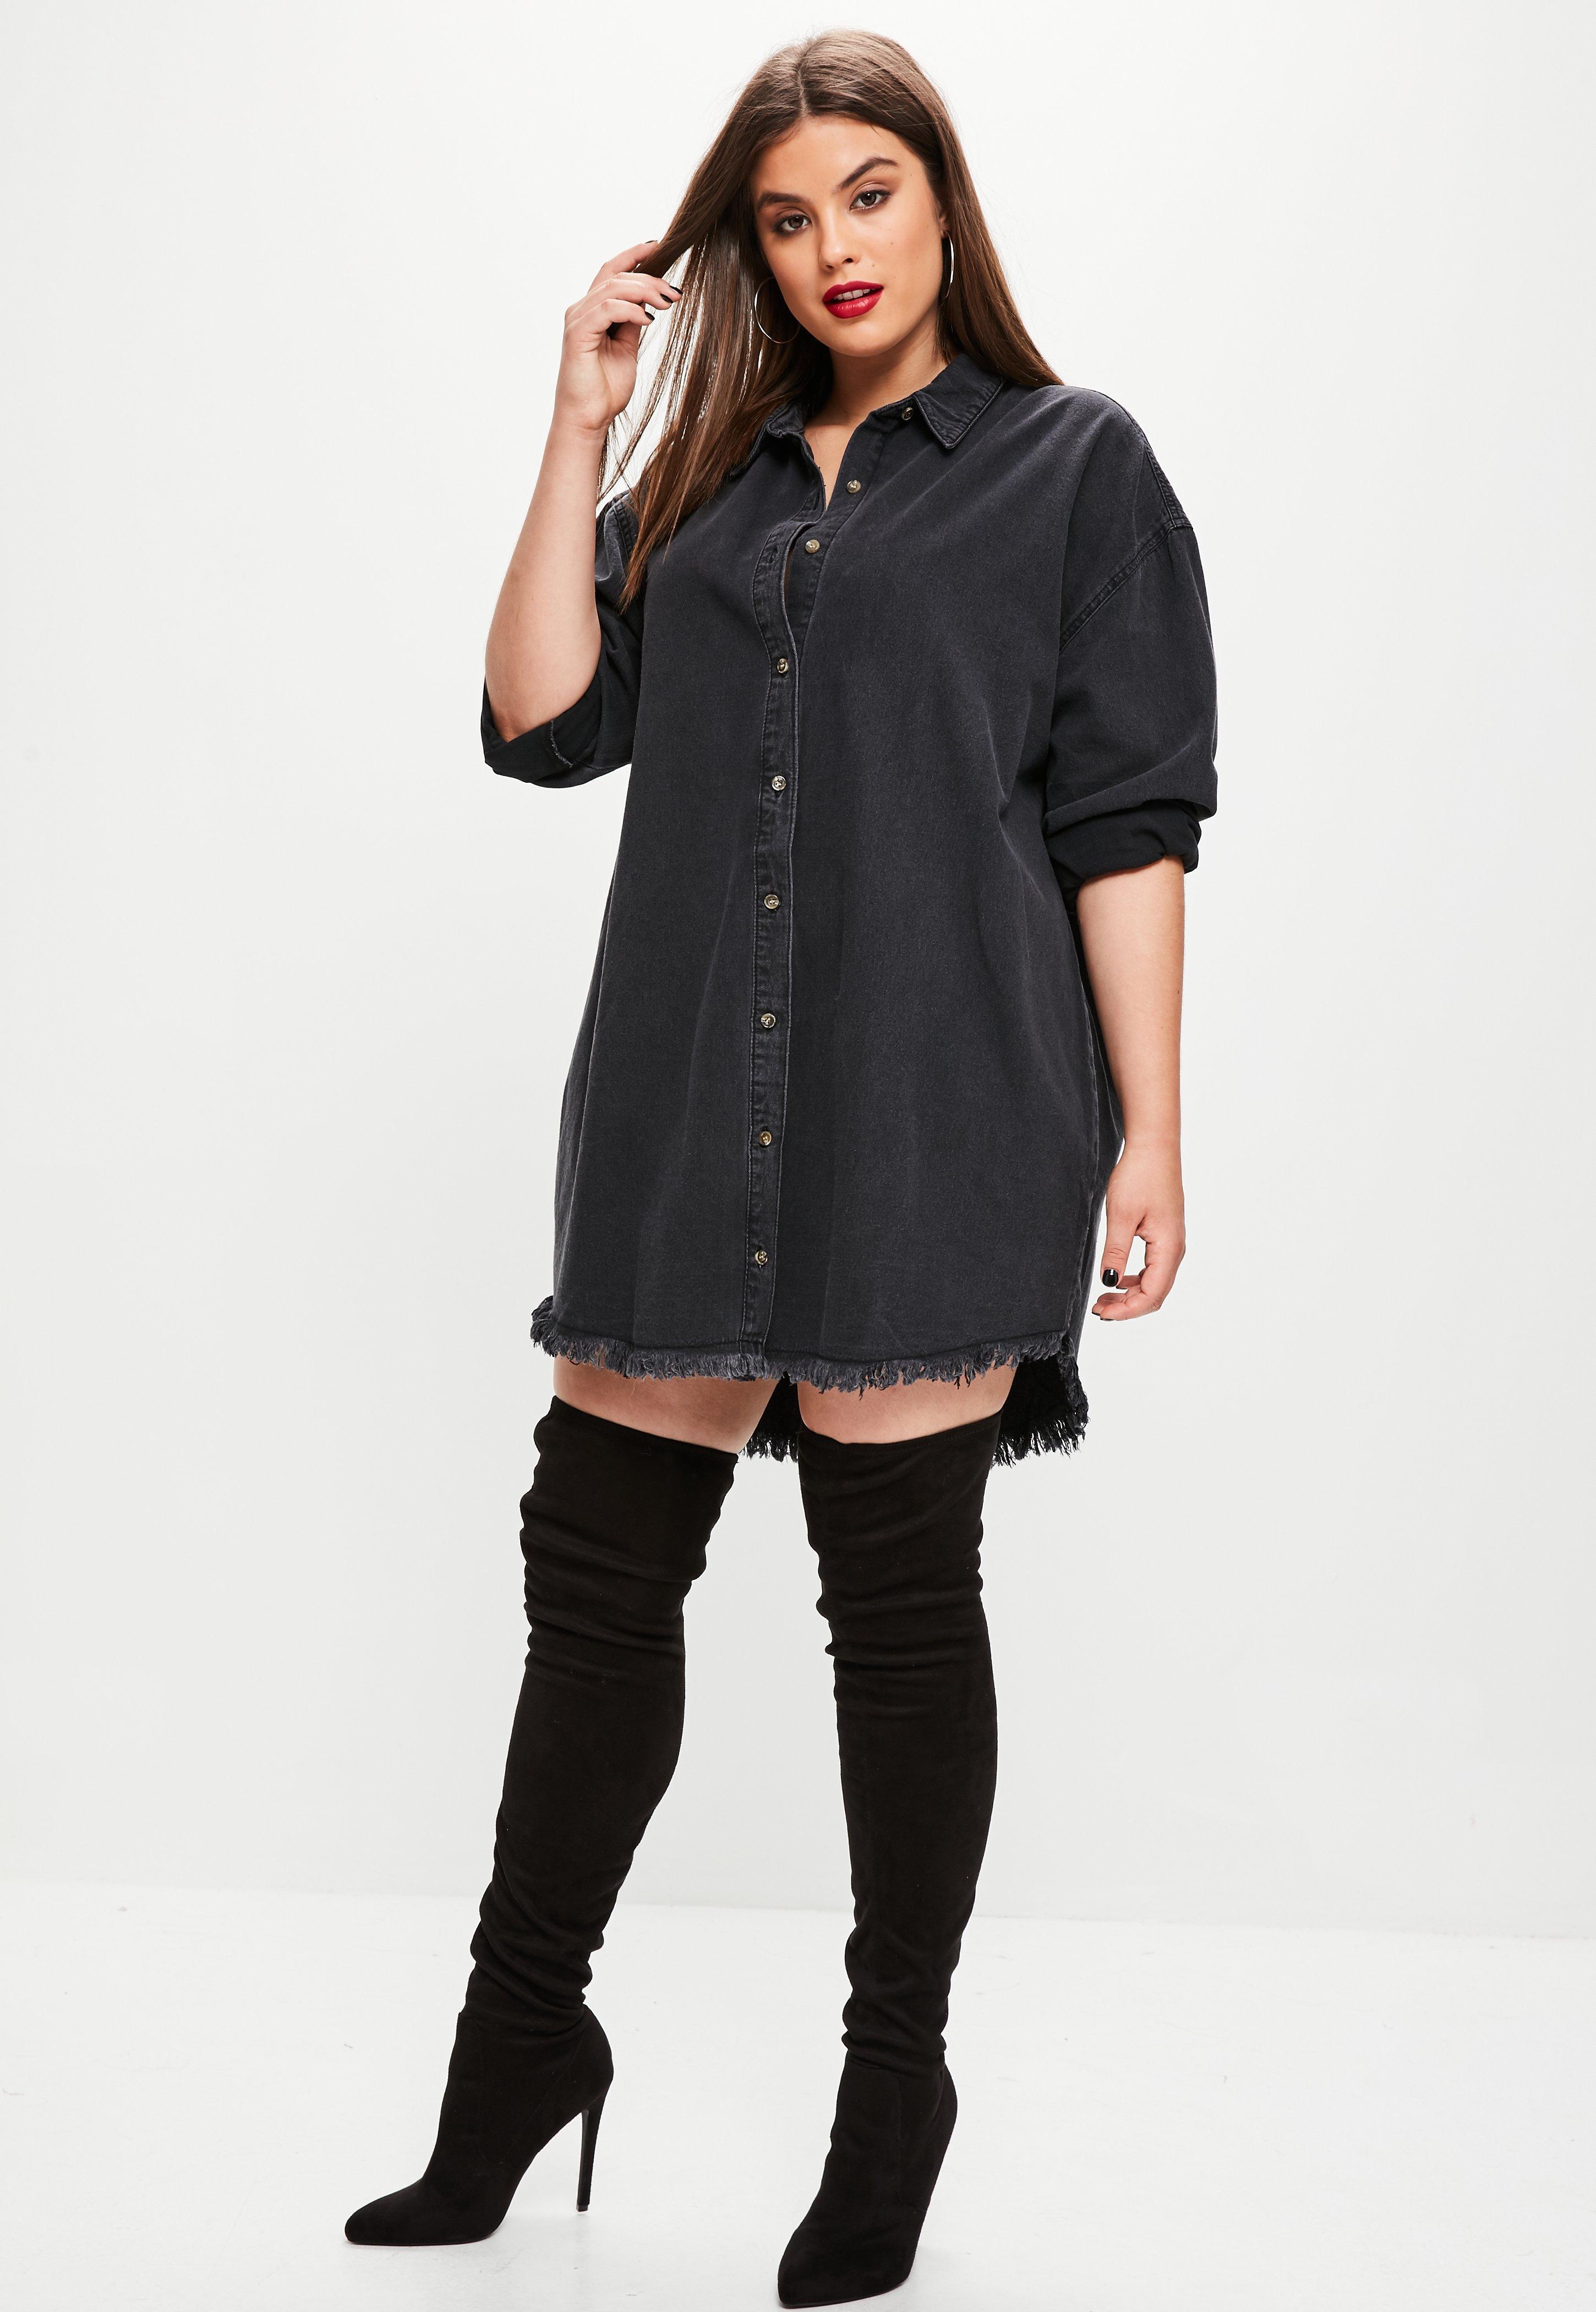 5d3fa798e43 Black Denim Shirt Dress Plus Size - Gomes Weine AG